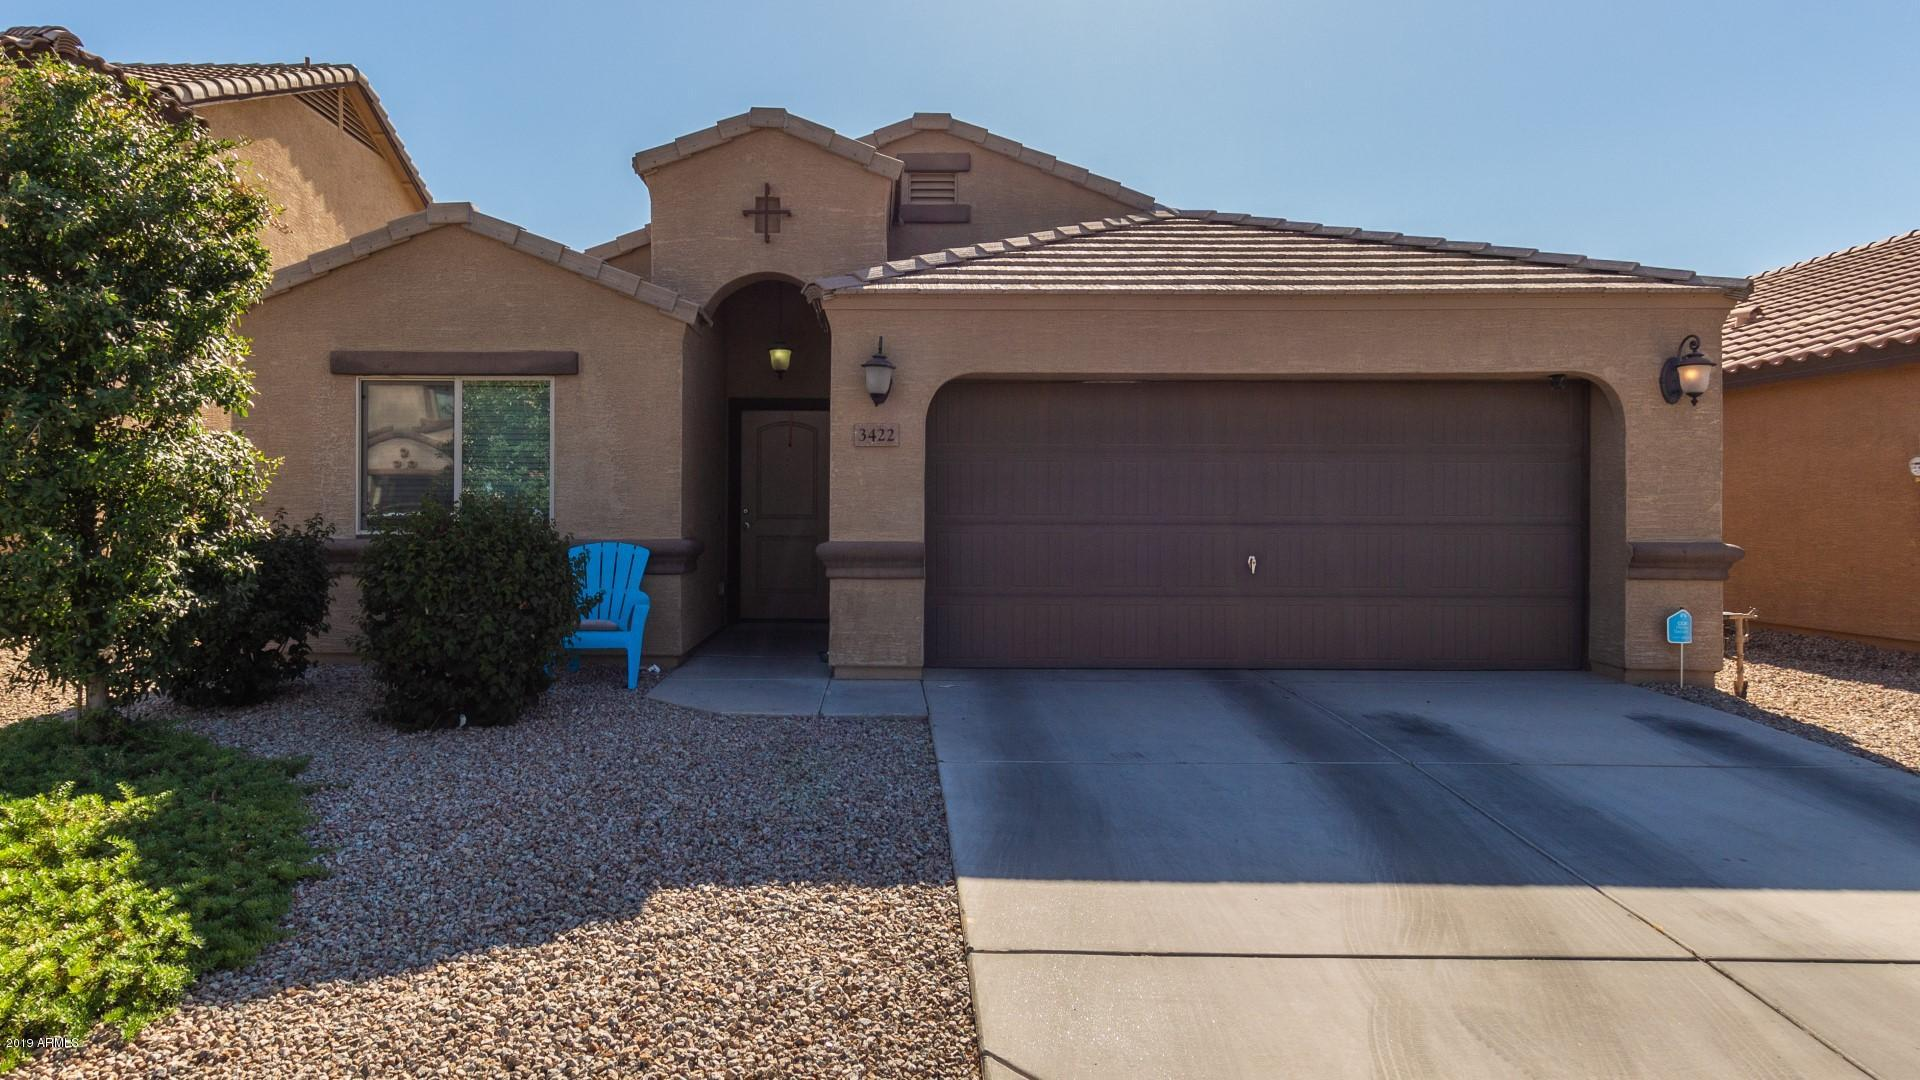 Photo of 3422 S 88TH Lane, Tolleson, AZ 85353